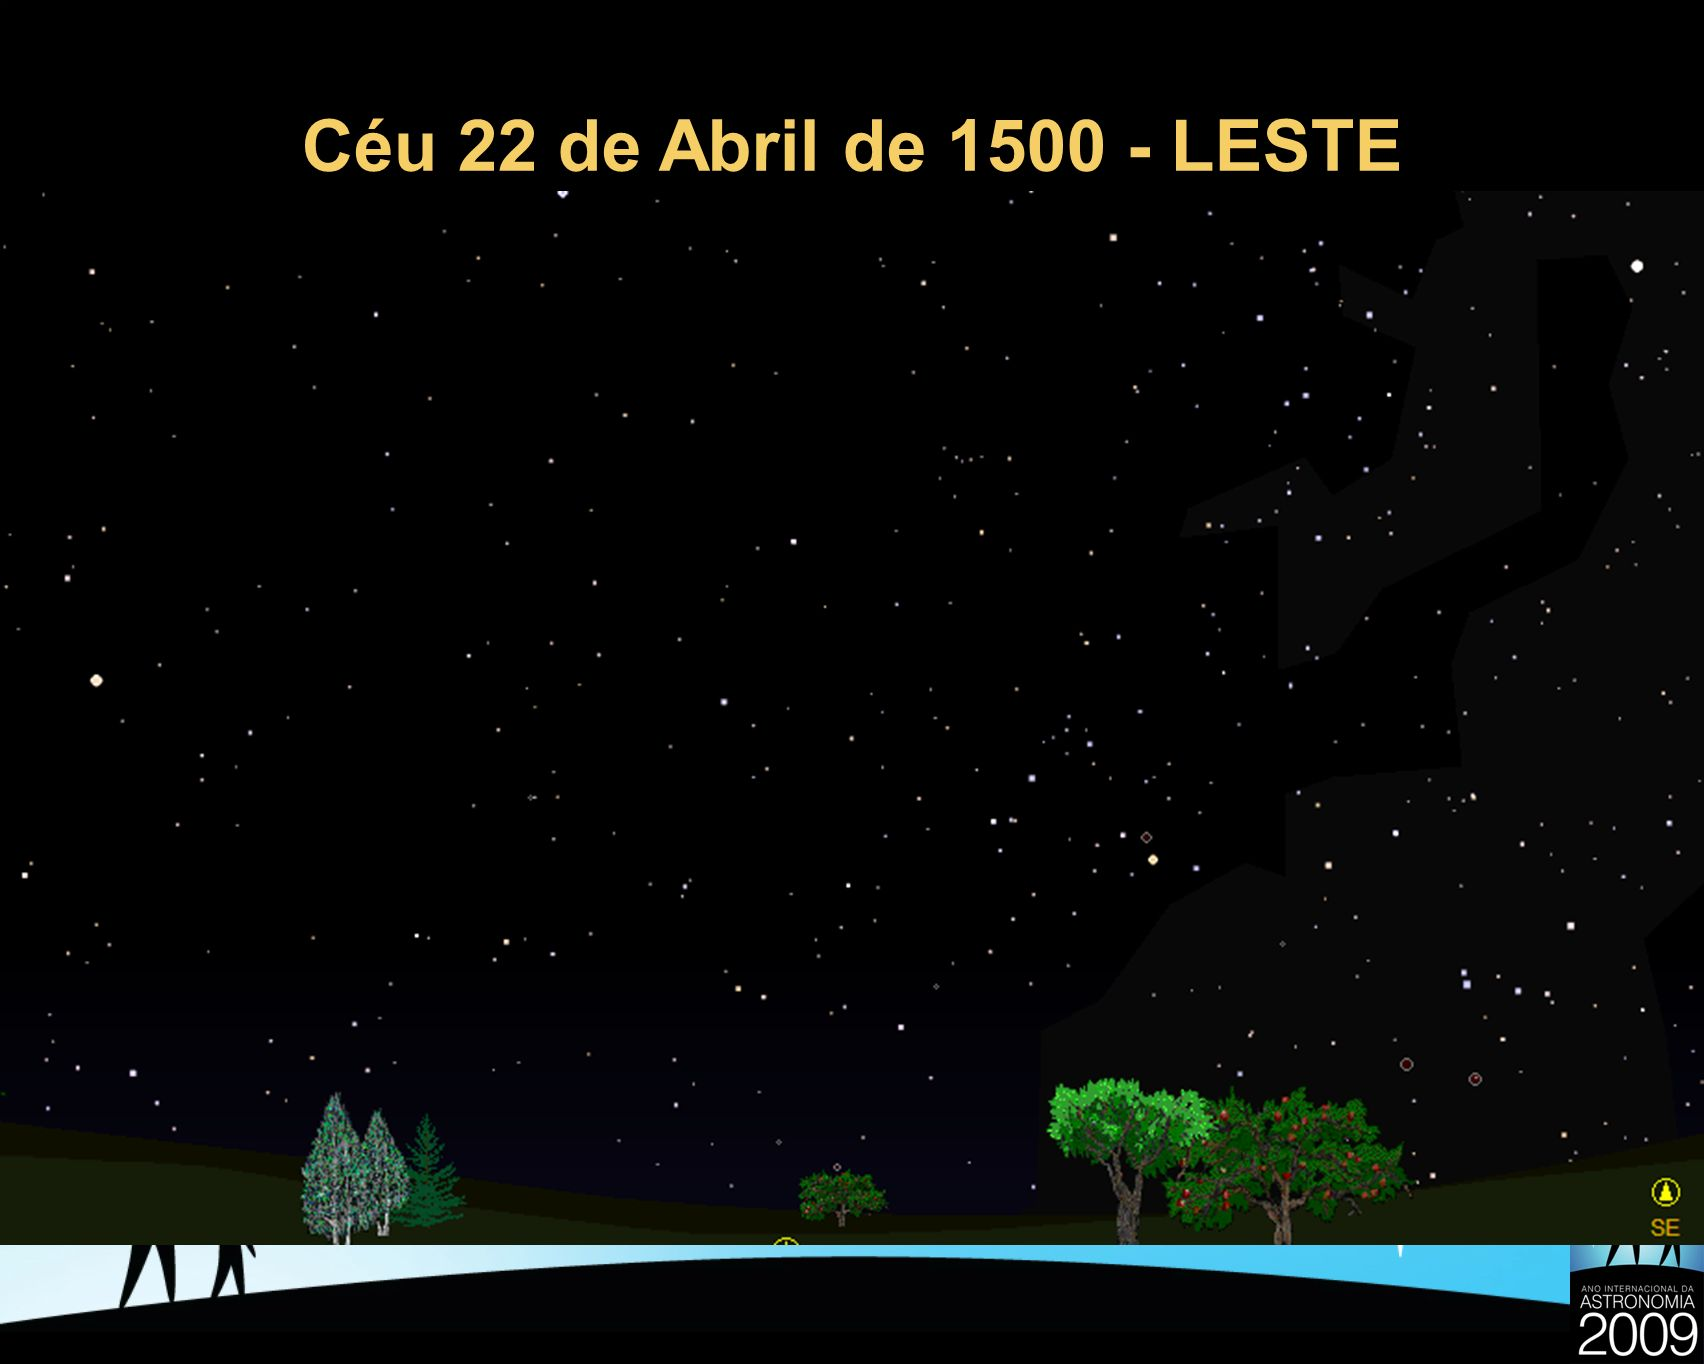 Céu 22 de Abril de 1500 - LESTE 19